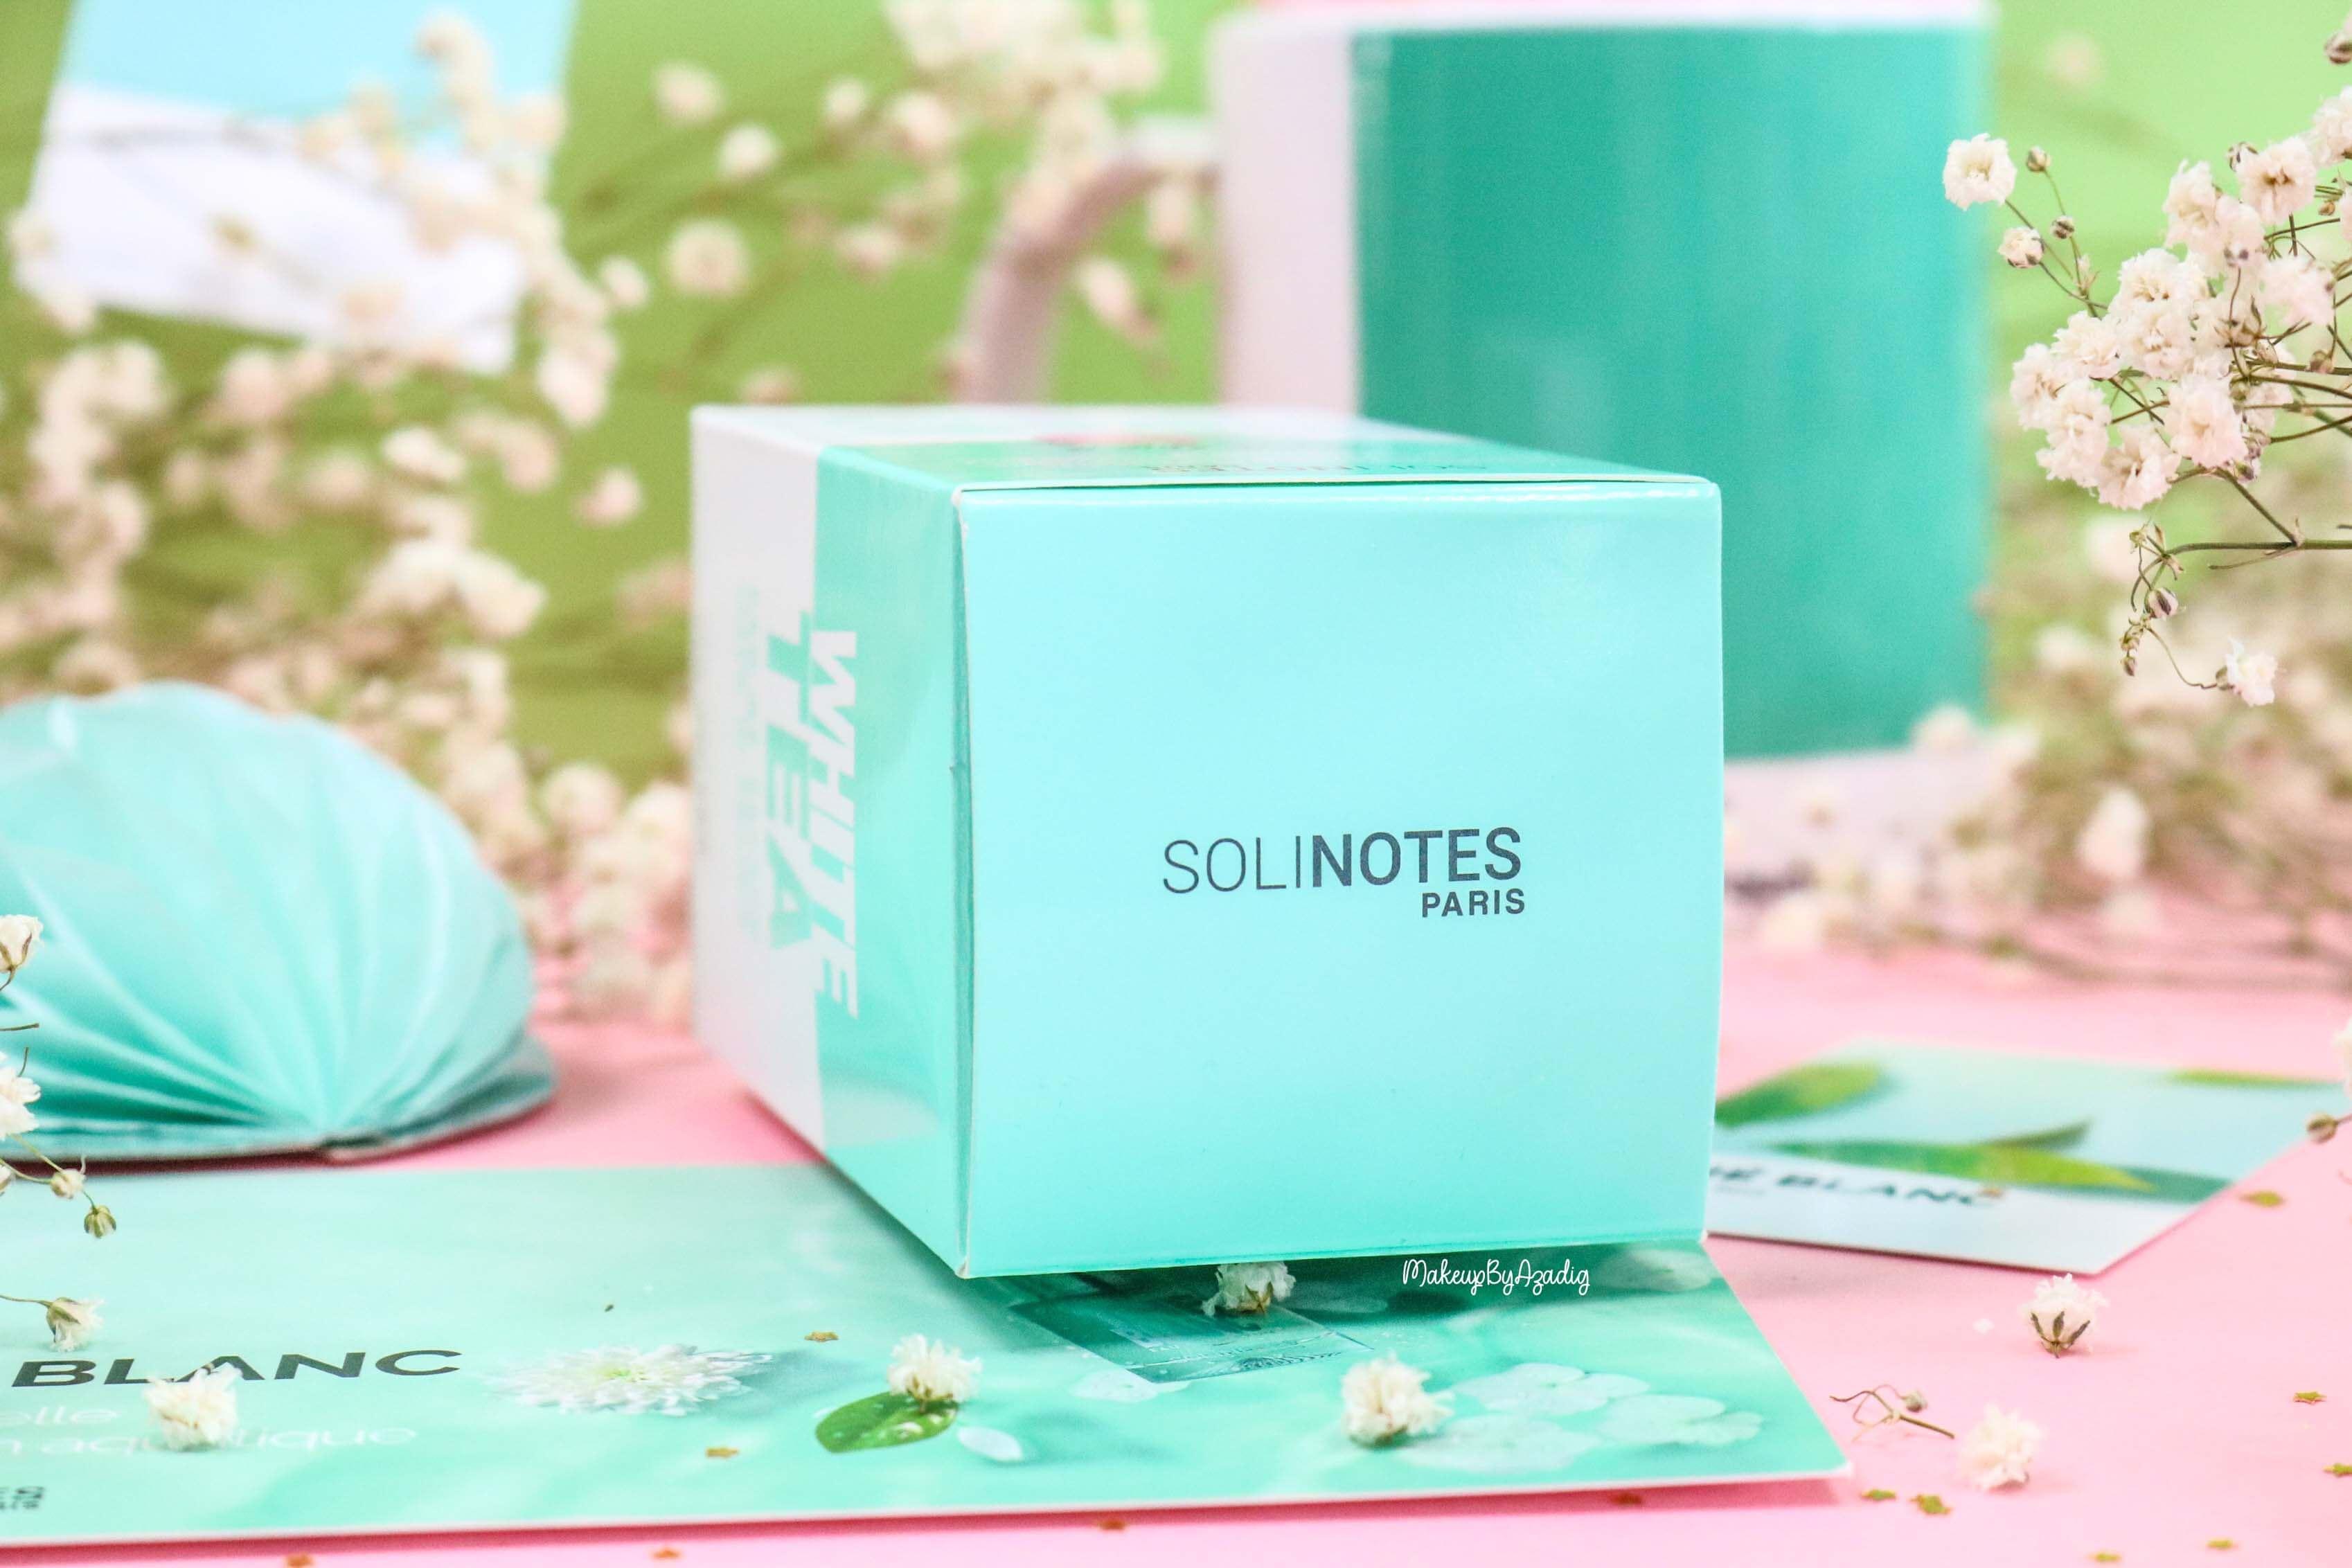 revue-parfum-solinotes-sephora-monoprix-the-blanc-vanille-oranger-prix-pas-cher-promo-makeupbyazadig-summer